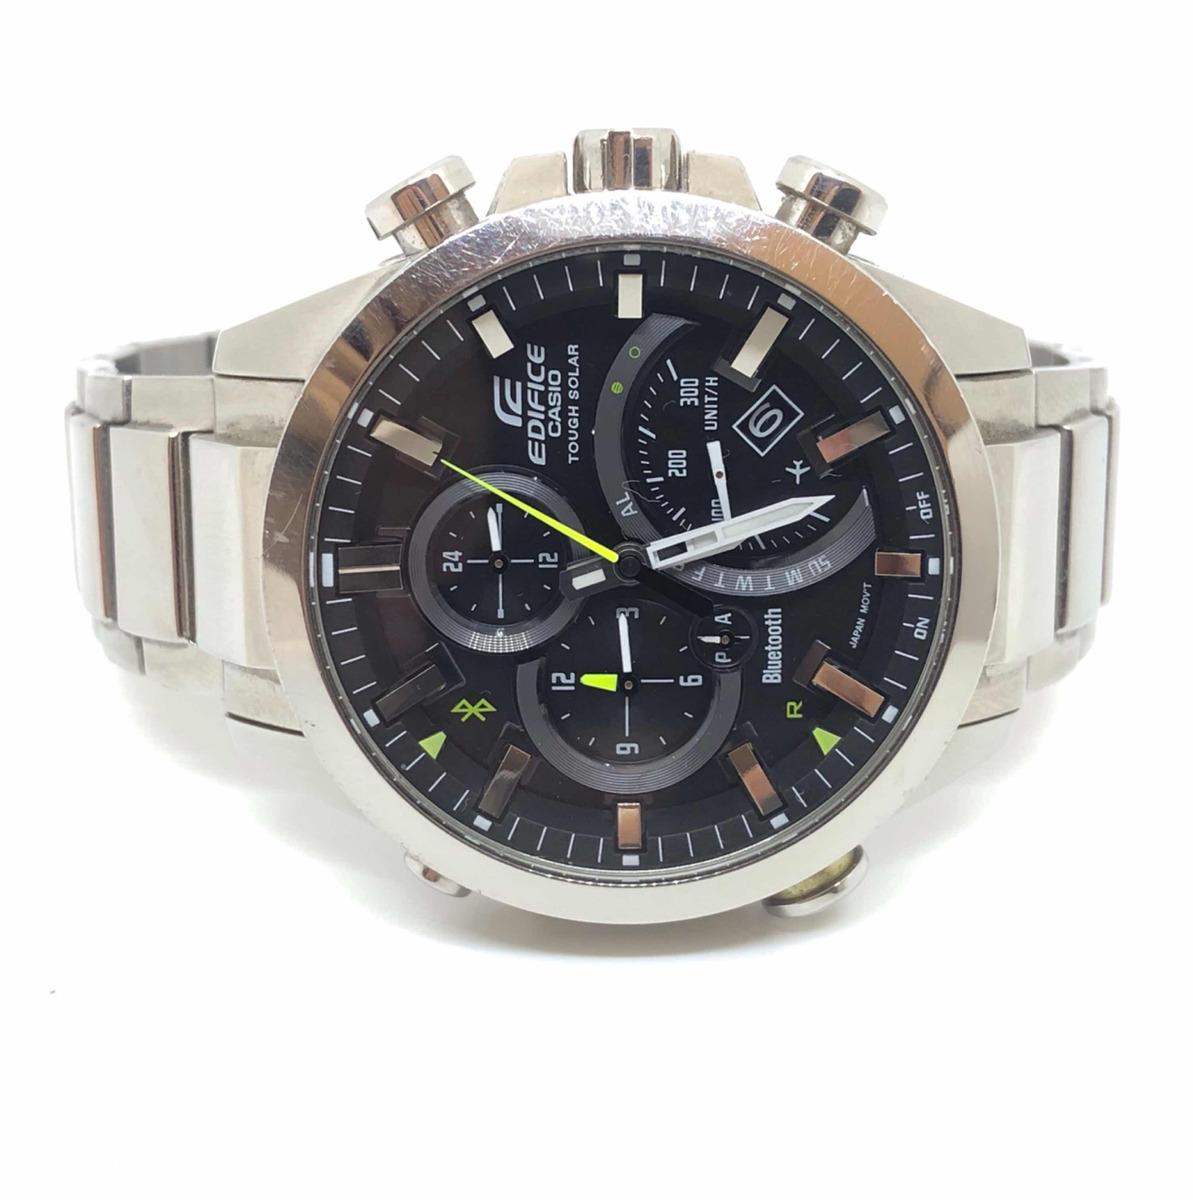 Reloj Casio Edifice Eqb 500 12 000 00 En Mercado Libre